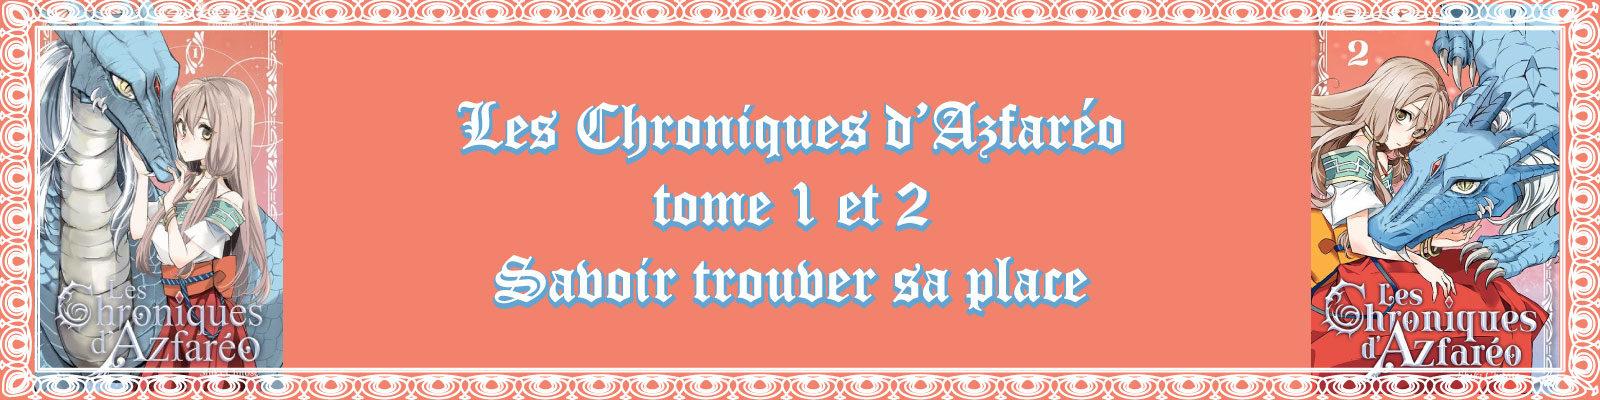 Les Chroniques d'Azfaréo-Vol.-1-1